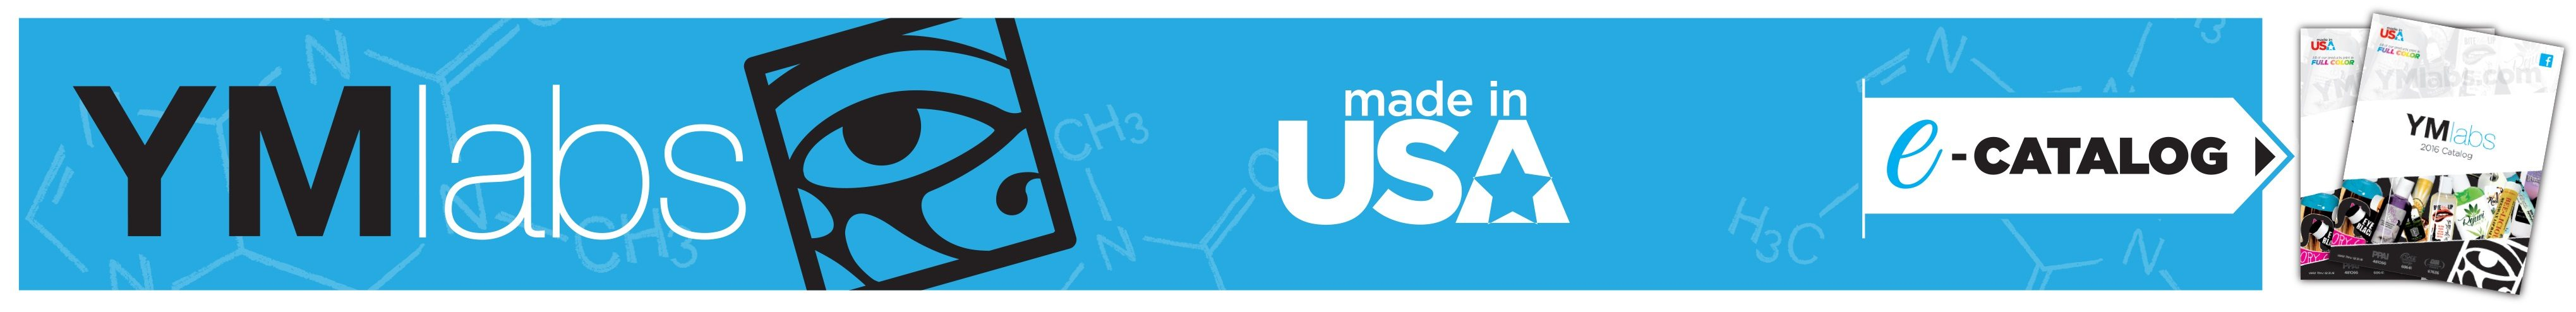 YMlabs, LLC - YMlabs.com - YM Labs - YML - Promo Lip Balm